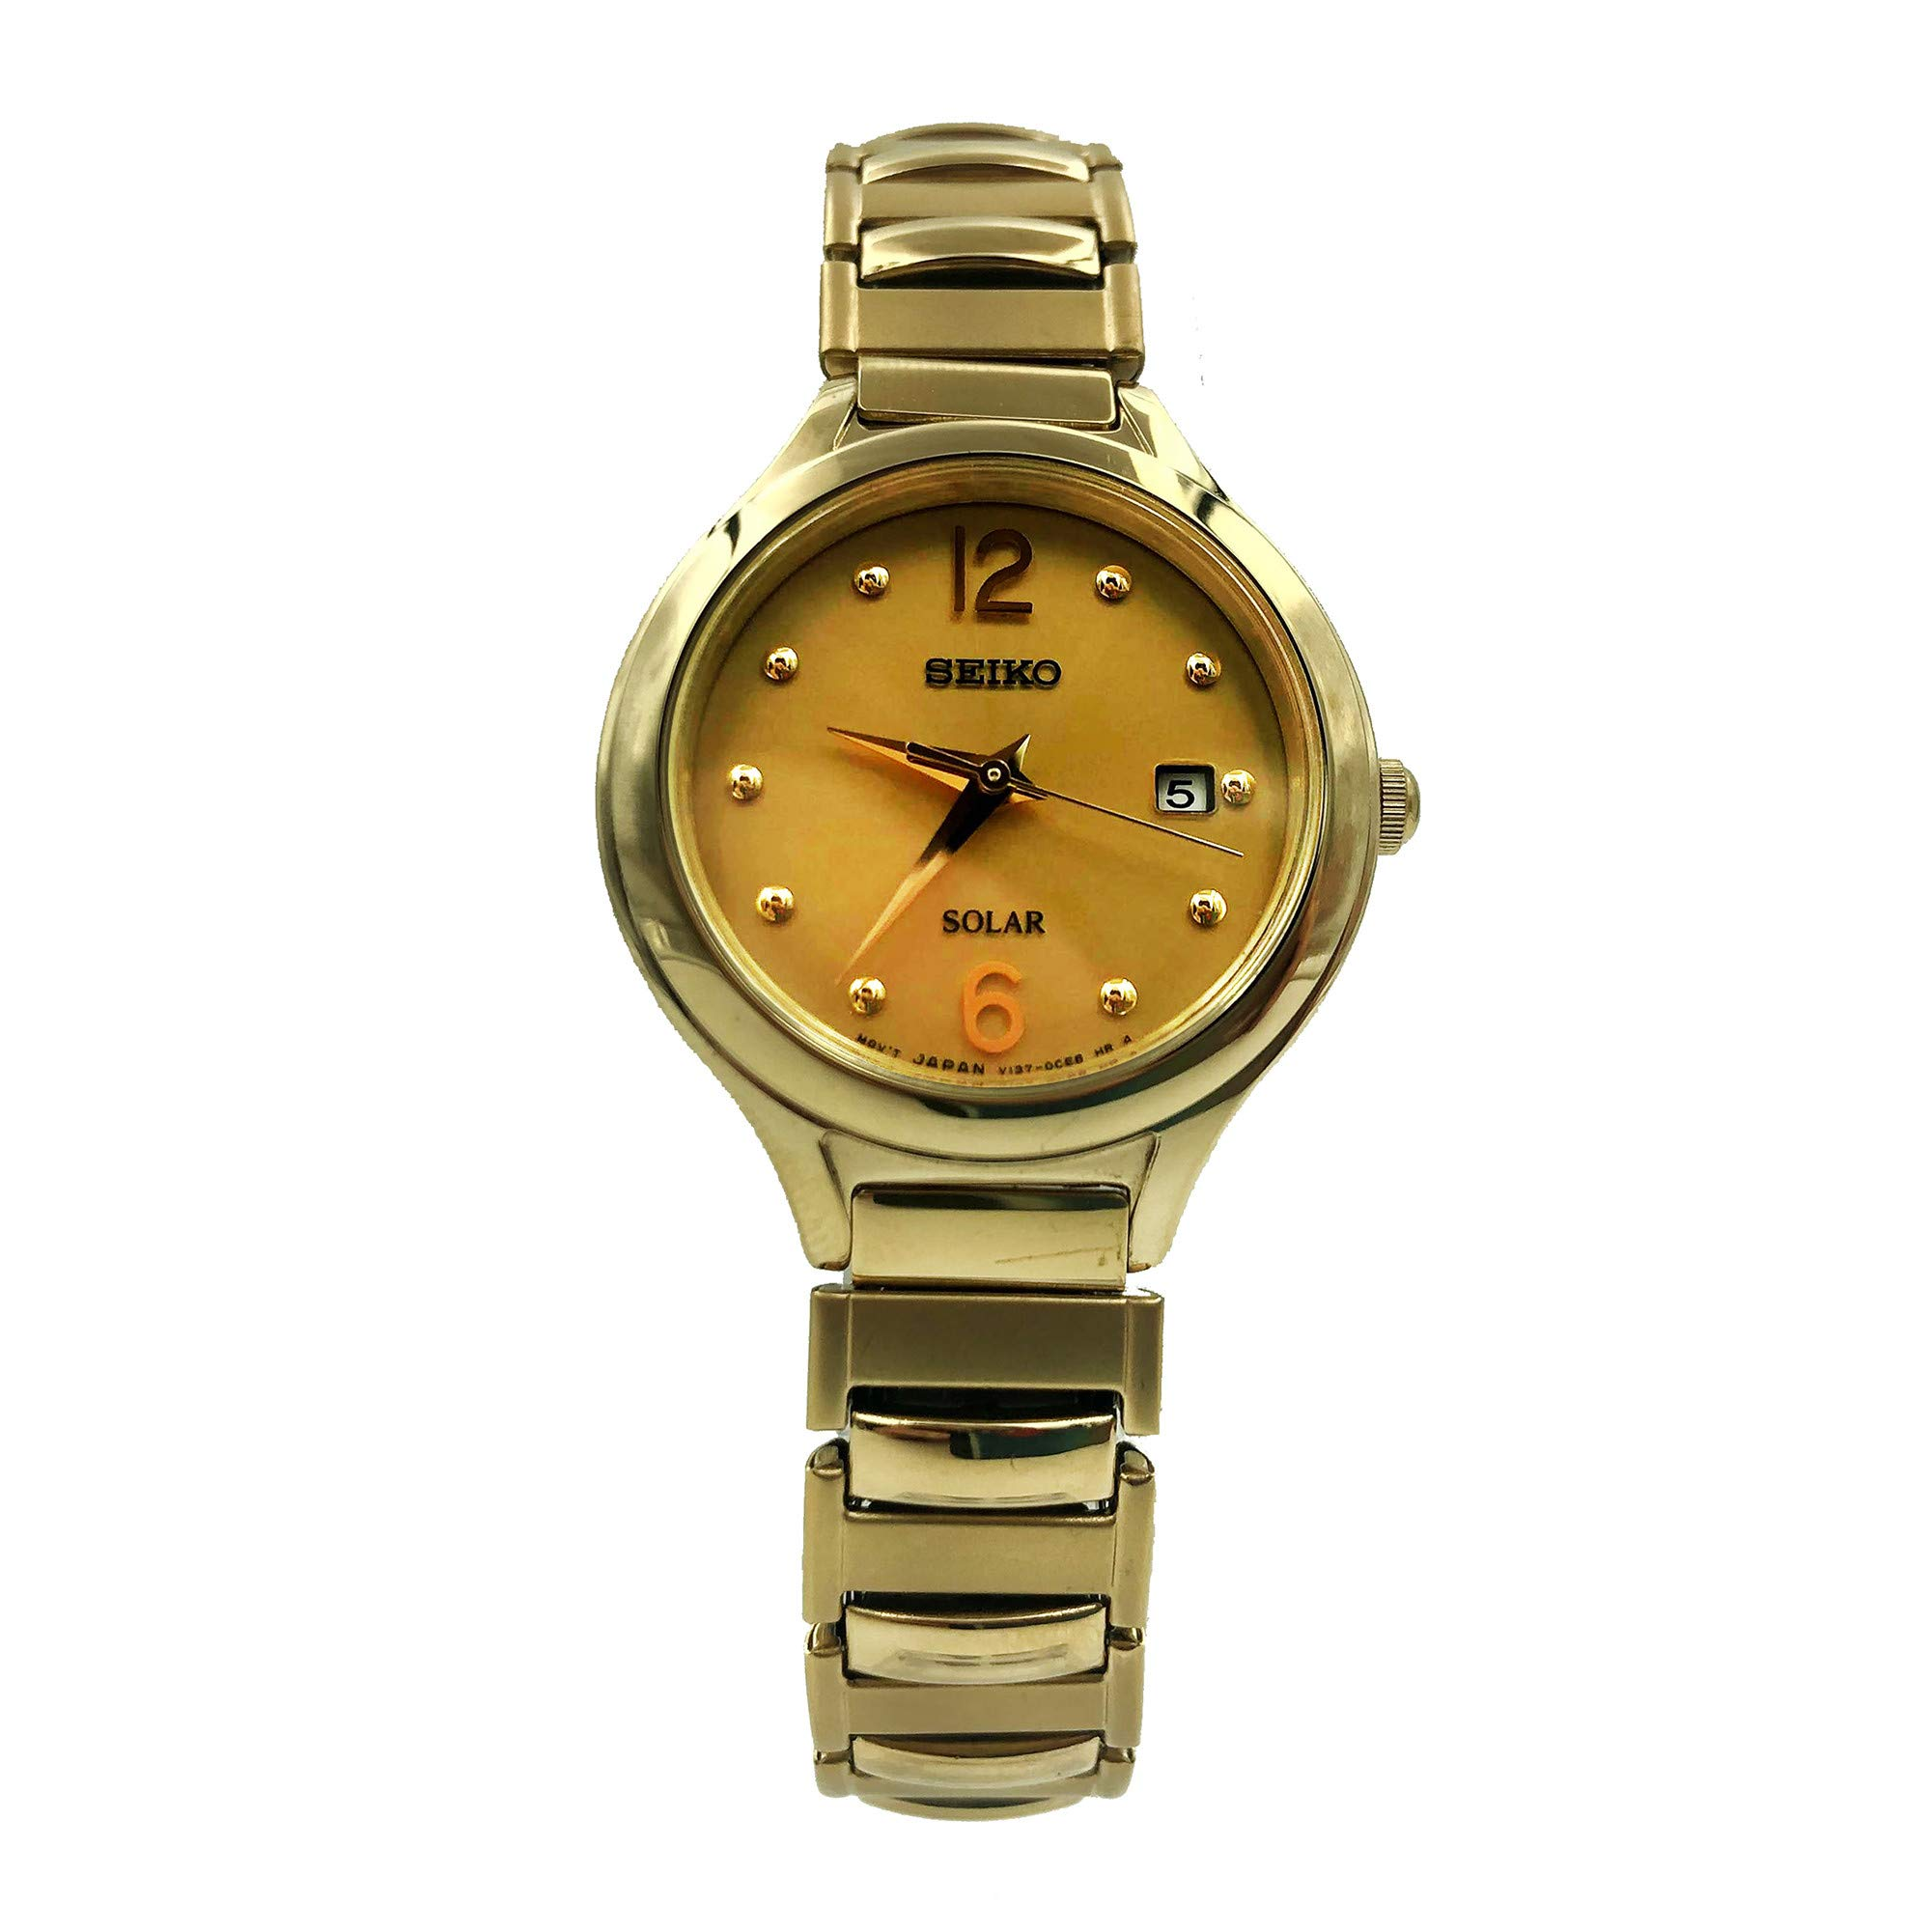 Seiko Core Quartz Male Watch SUT180 (Certified Pre-Owned) by SEIKO